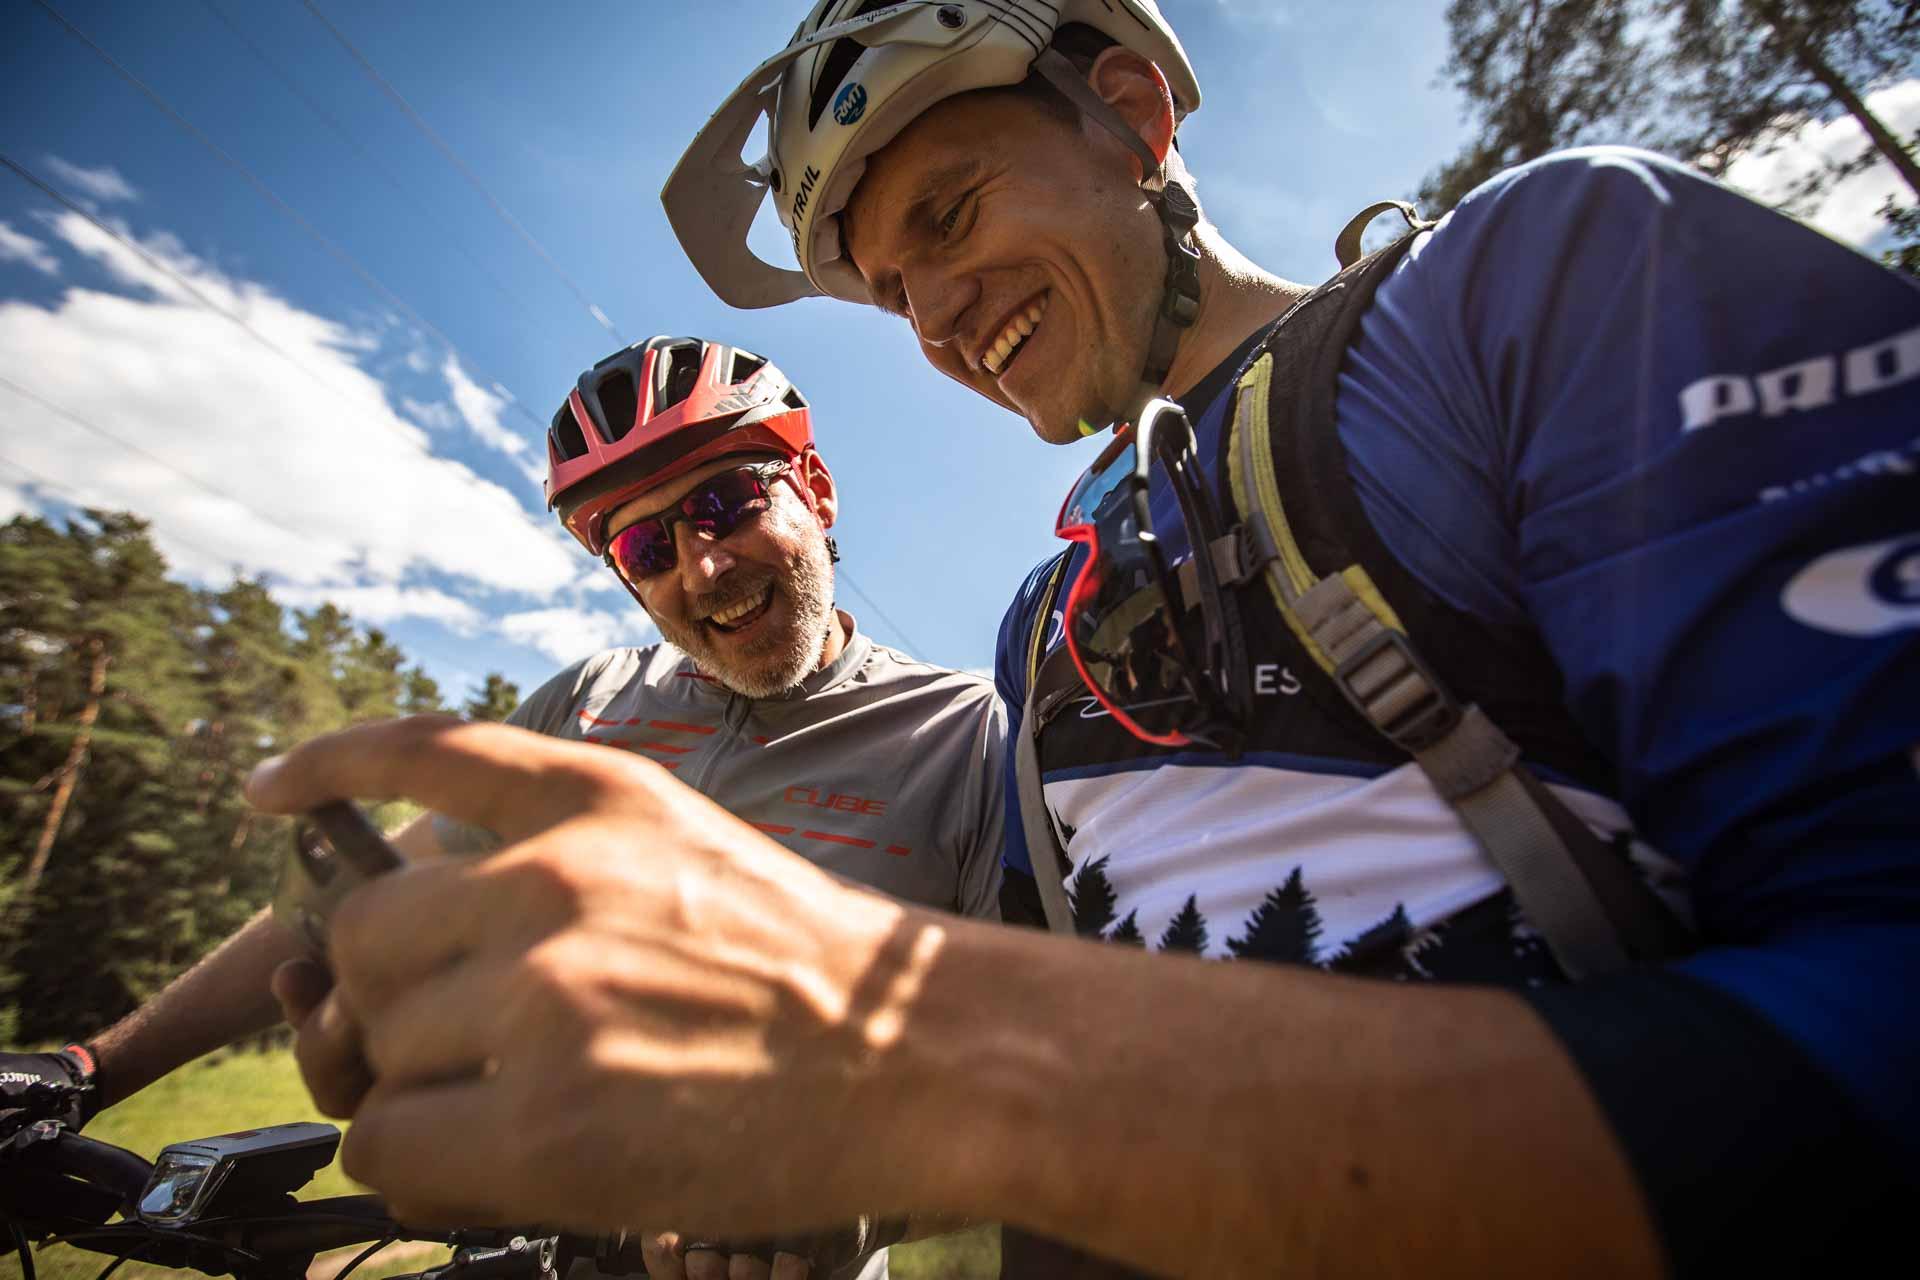 eMTB eBike Fortgeschritten Fahrtechnik Kurs in Siegen - Rock my Trail Bikeschule316